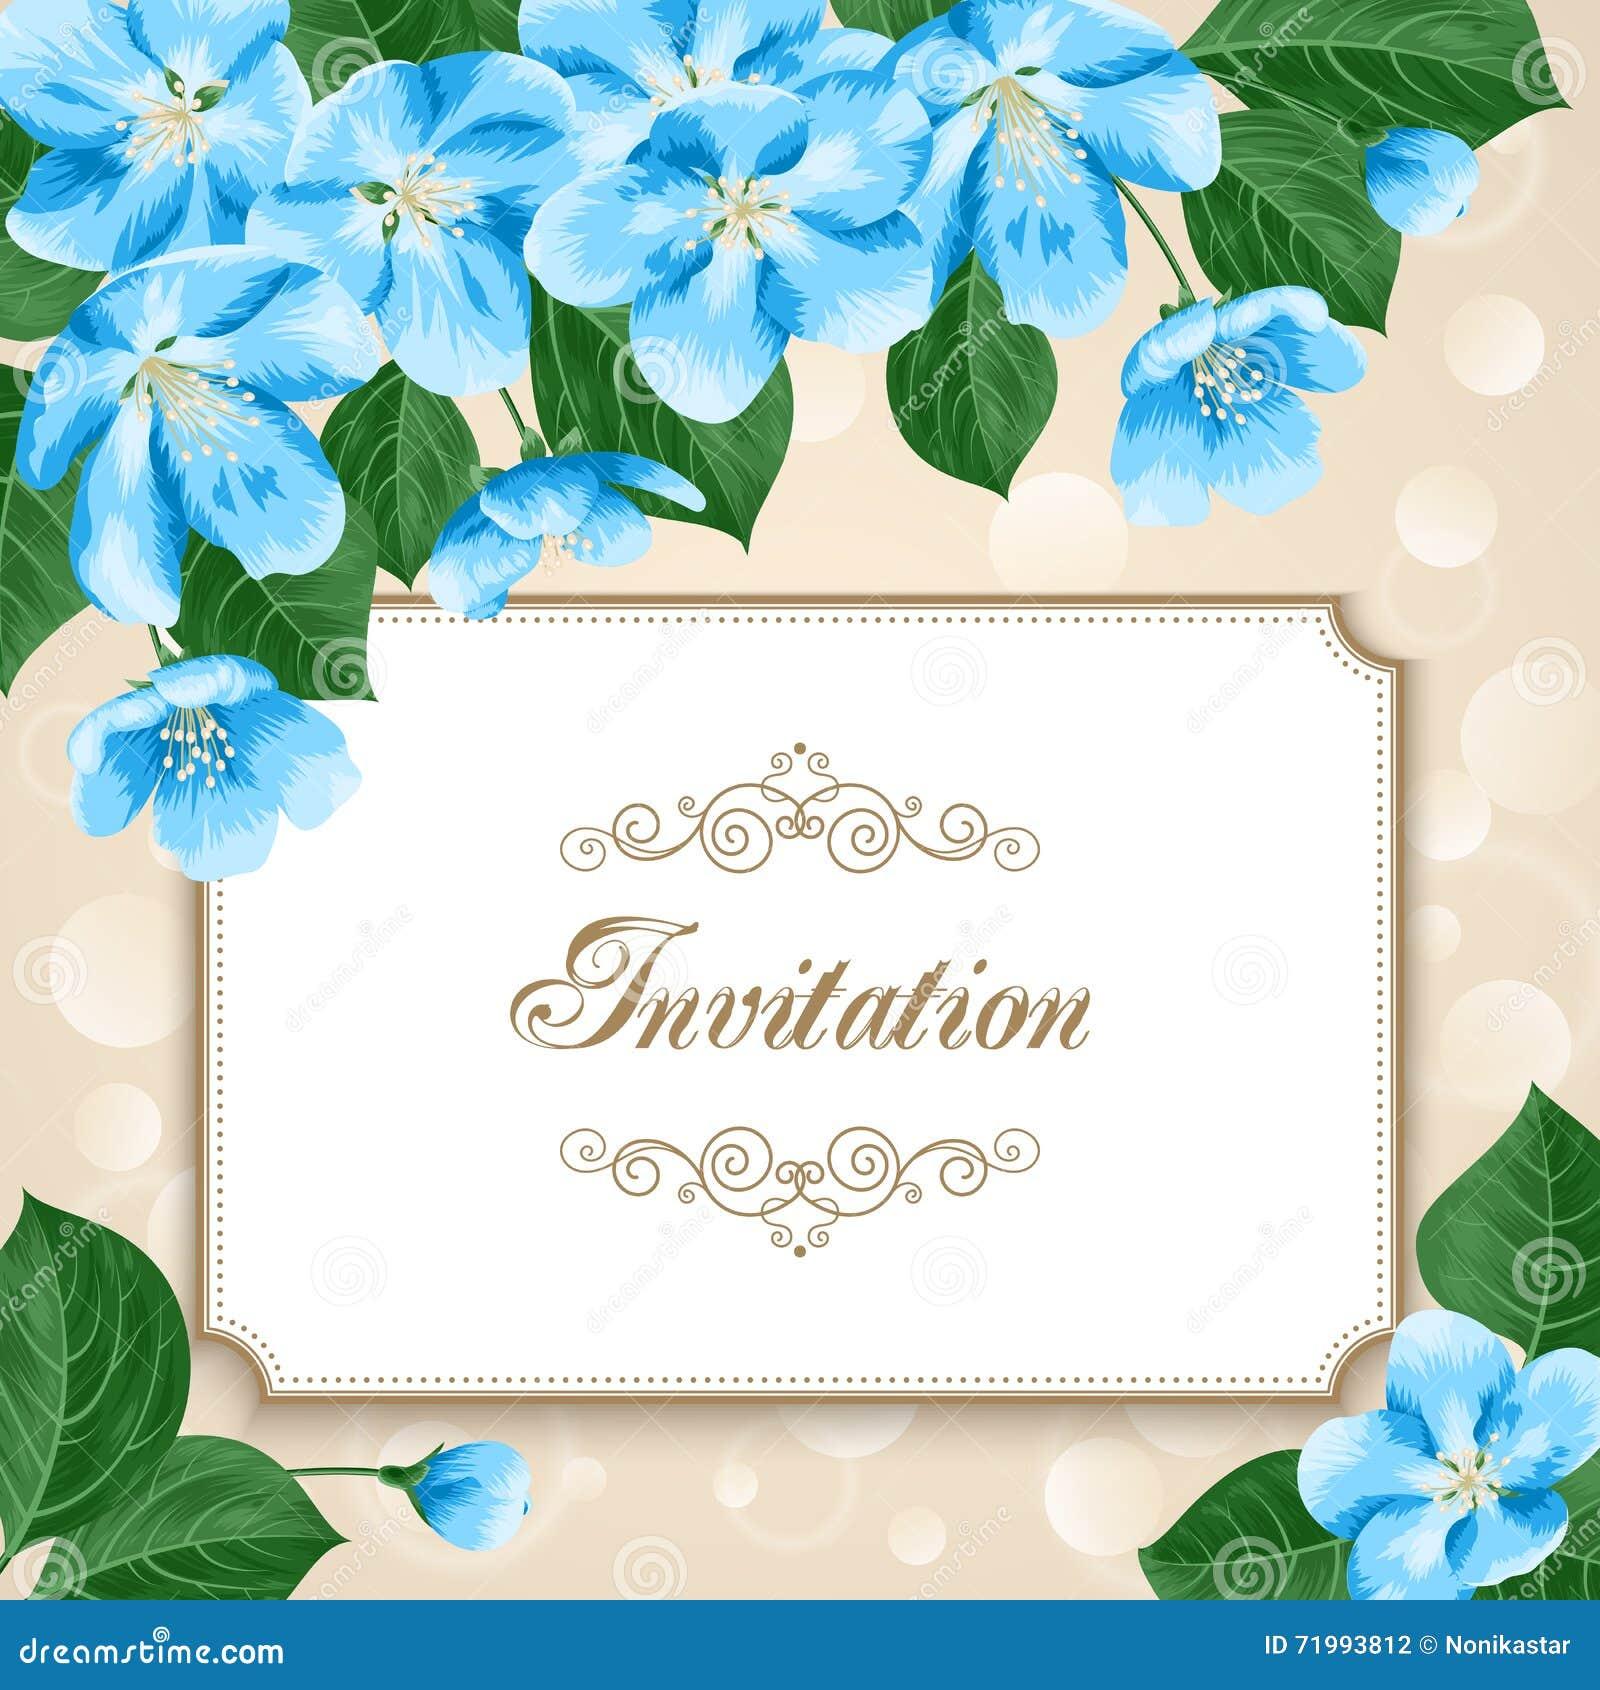 vintage floral invitation template stock vector illustration of